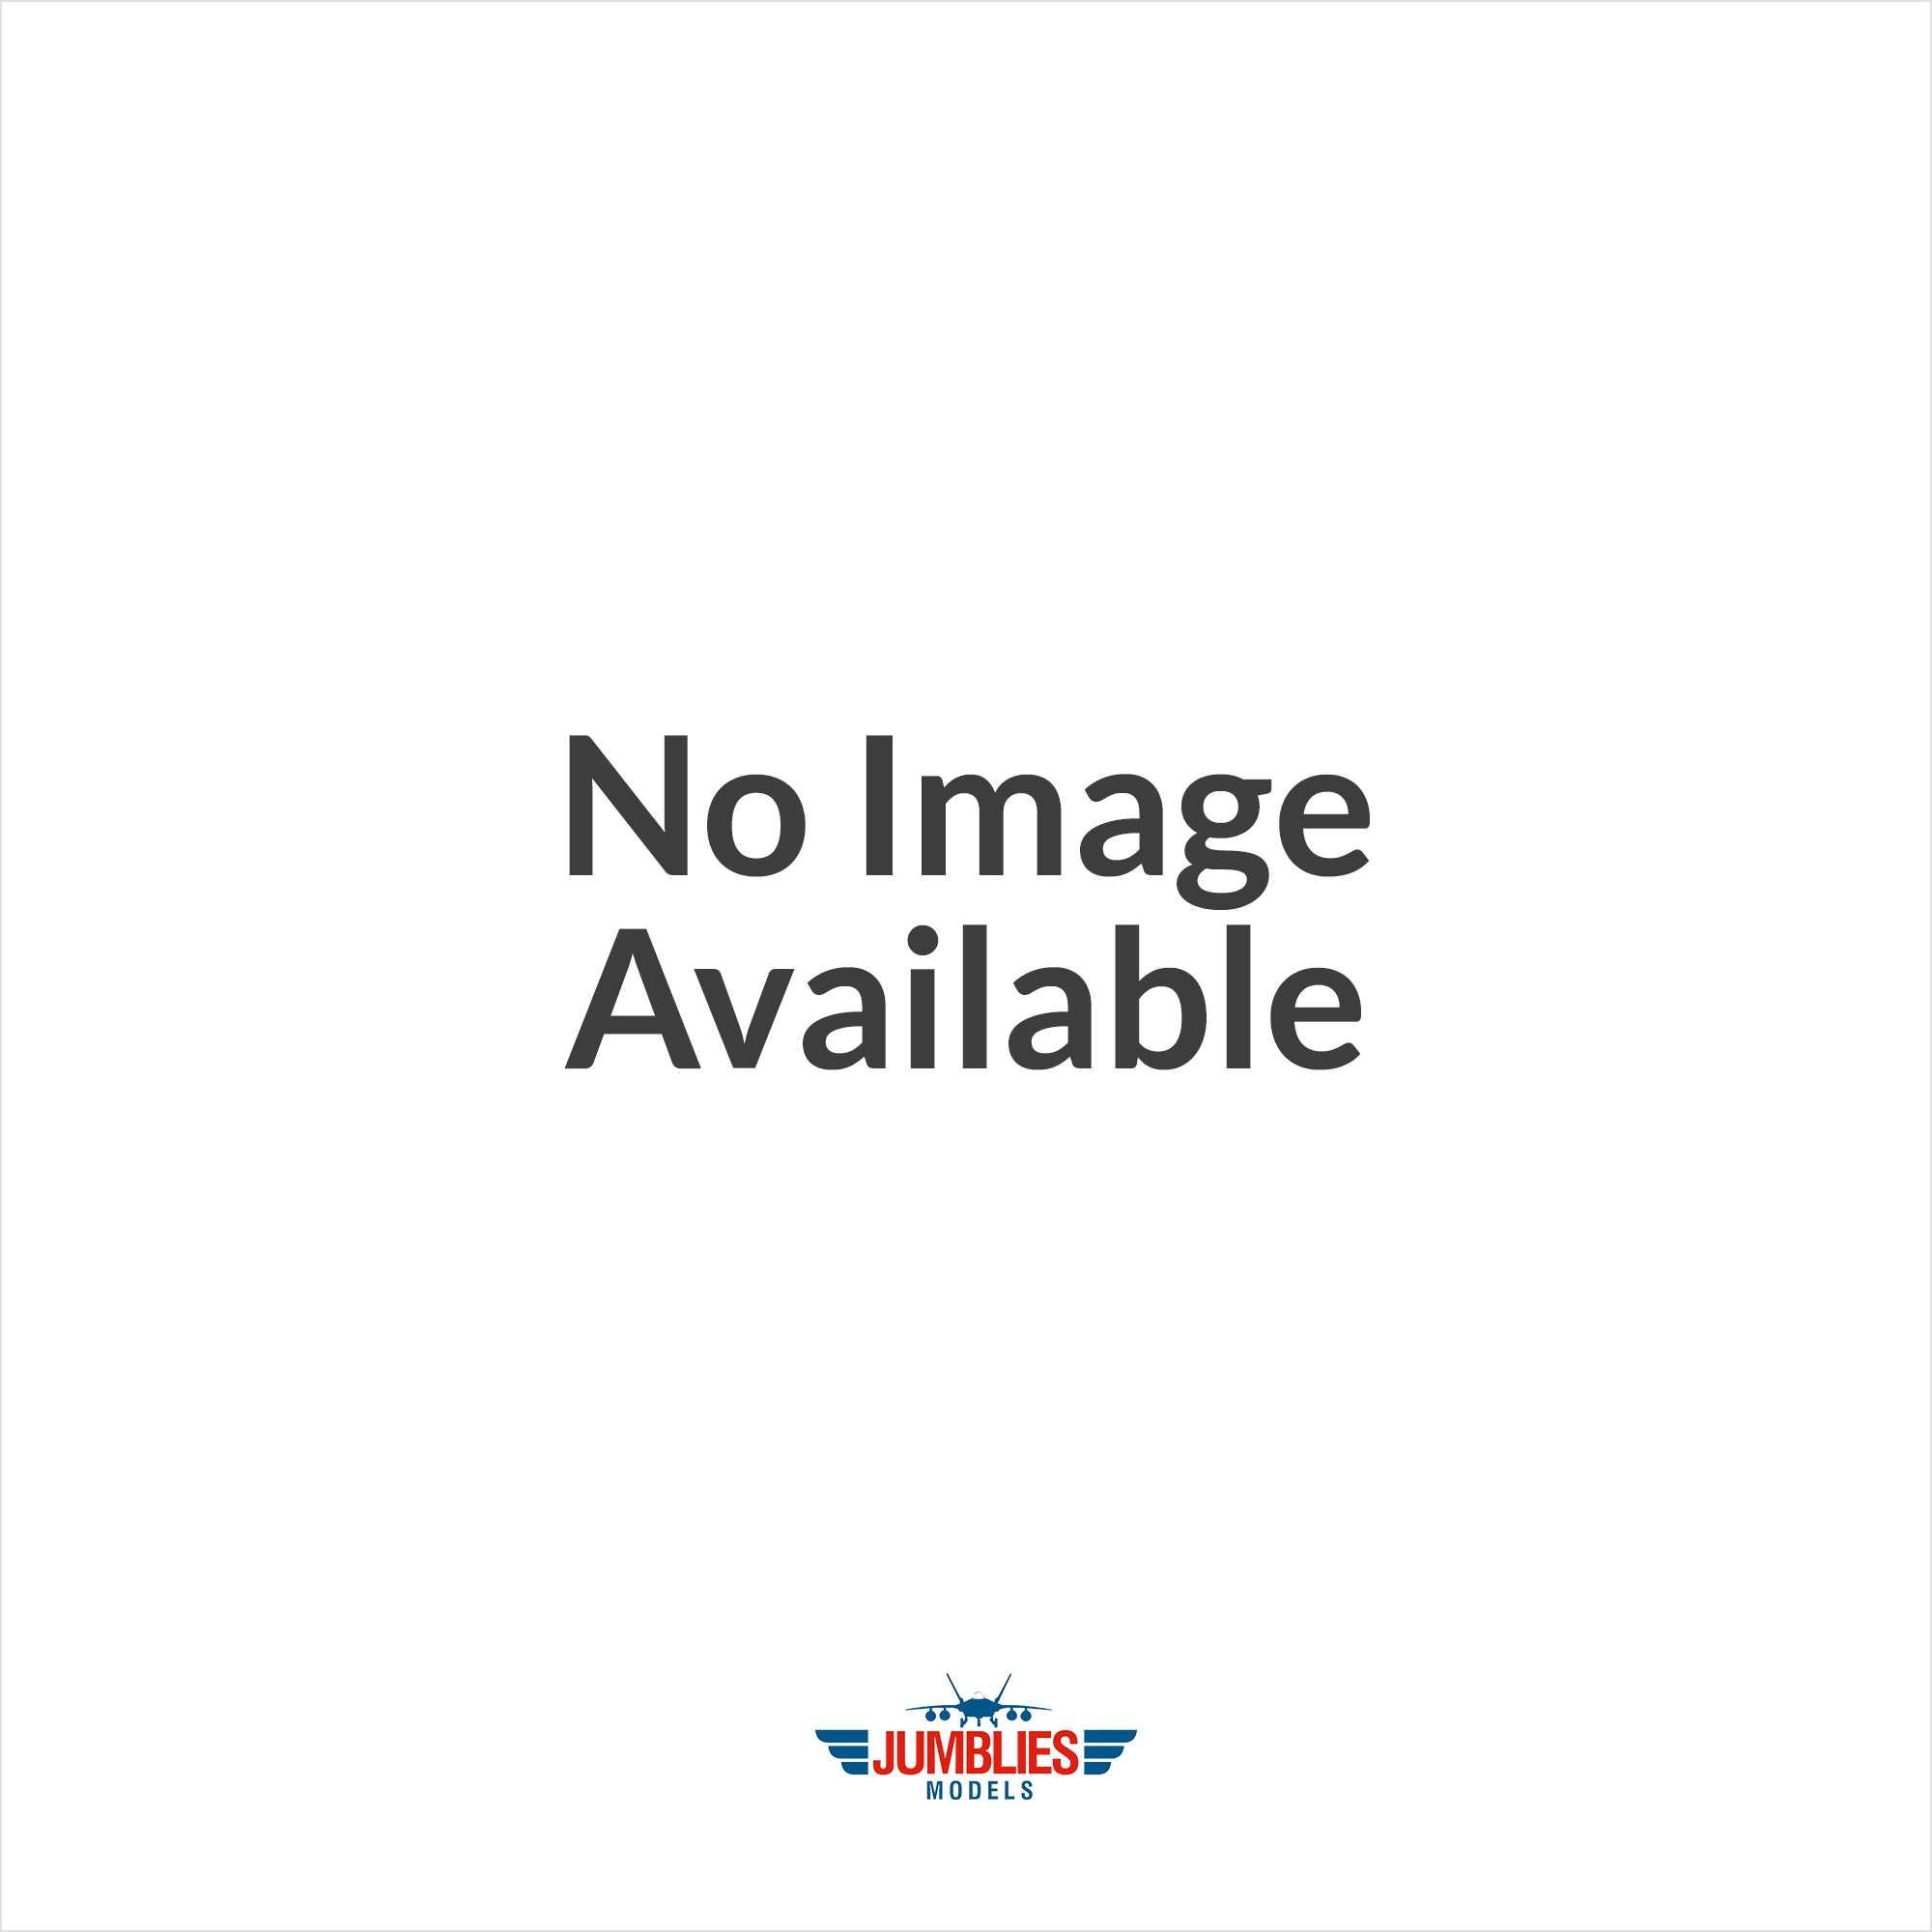 Century Wings 1:72 F-14A Tomcat VF-84 Jolly Rogers AJ203 1978 (Normal Version)